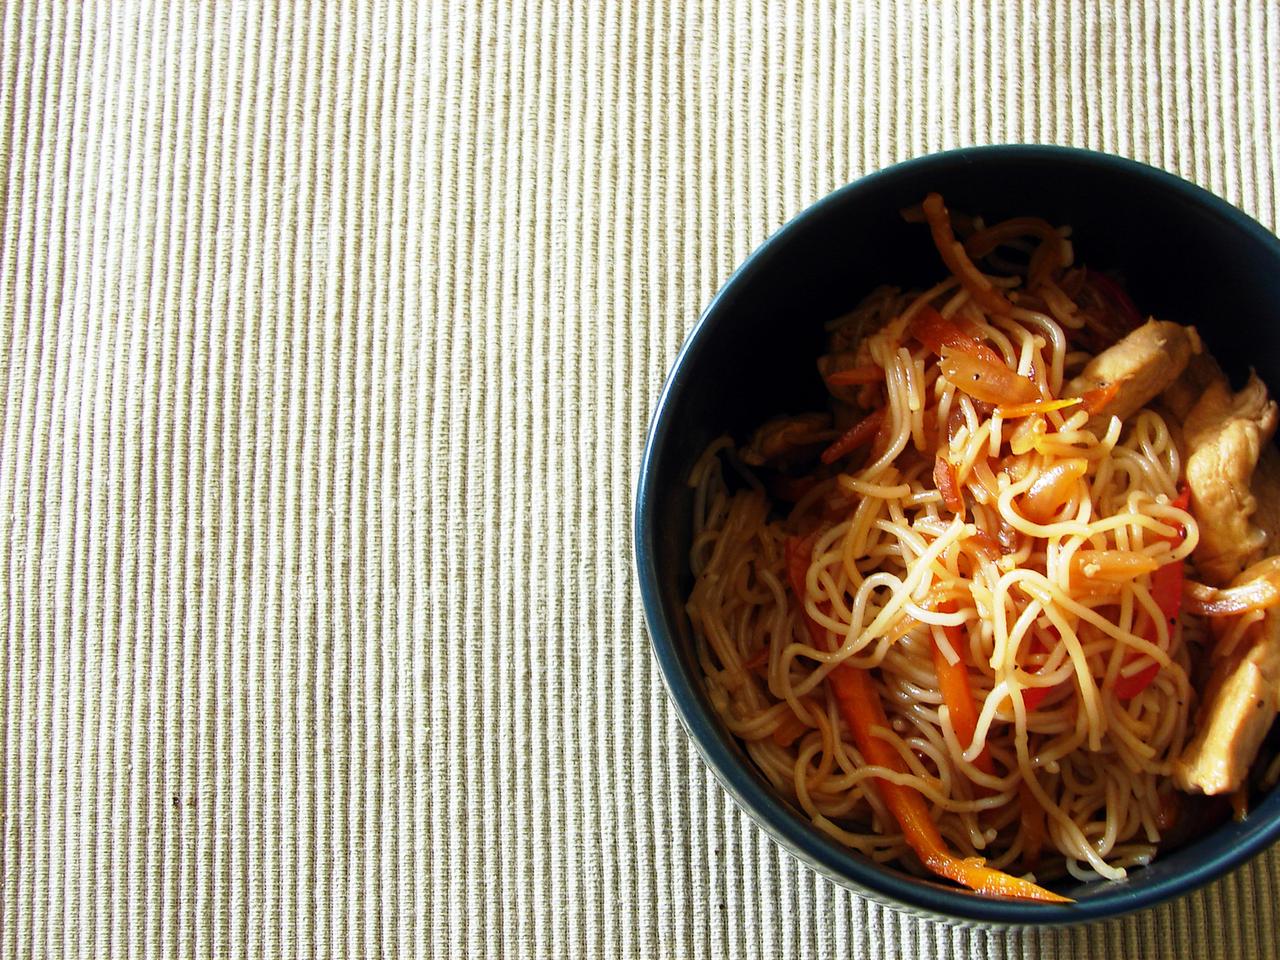 Noodles-con-setas-shiitake4